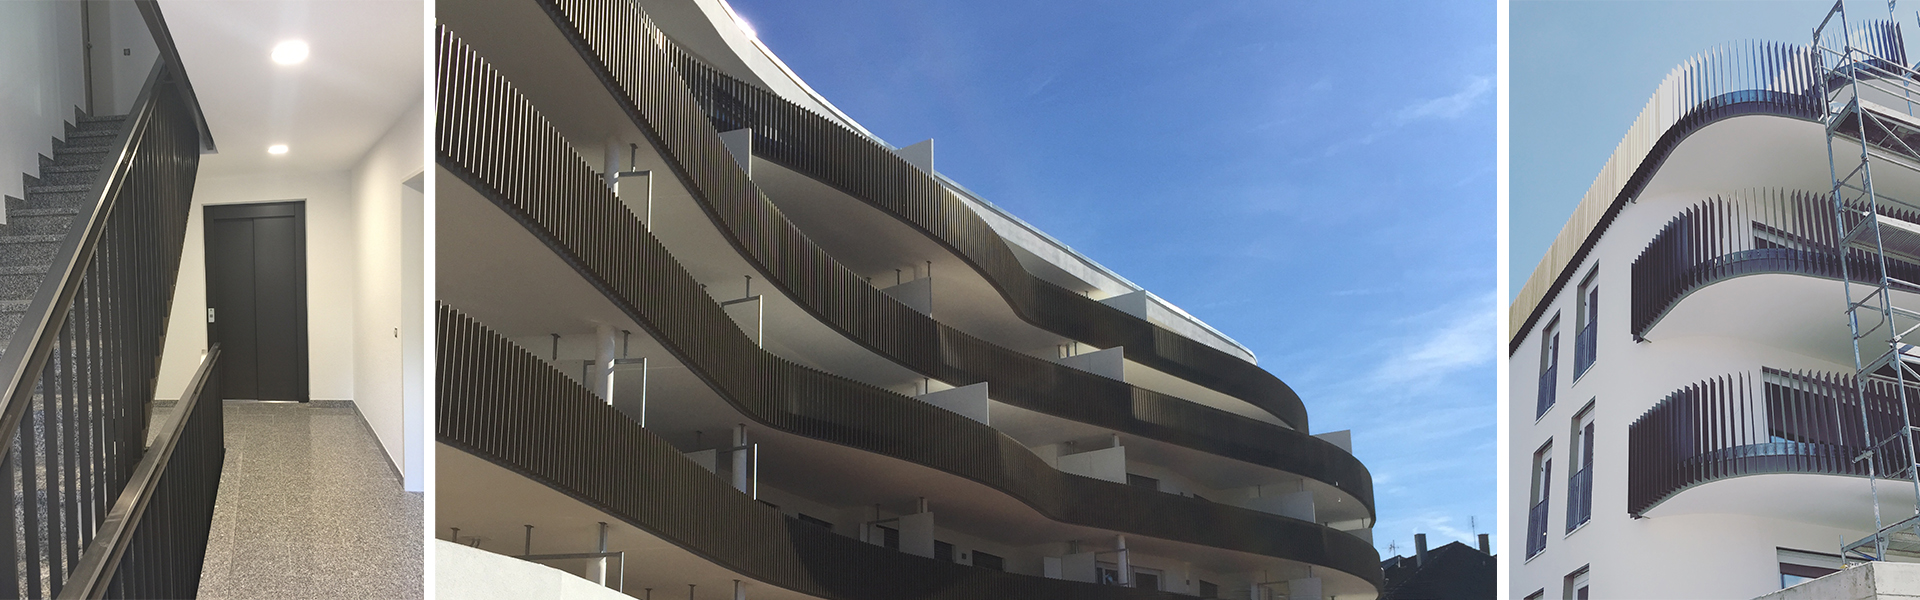 gb-architekten-slider-kesslerstrasse-2